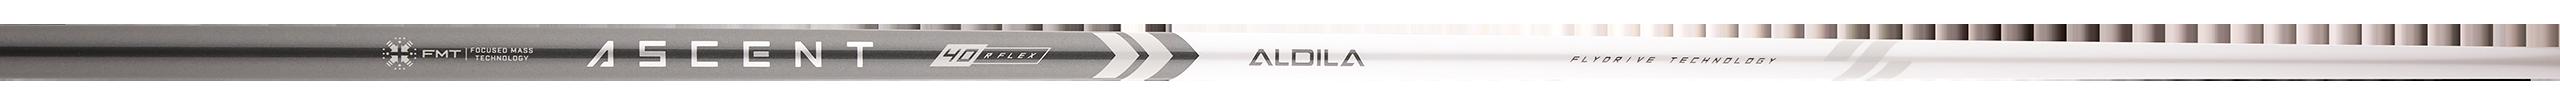 Aldila Ascent 40